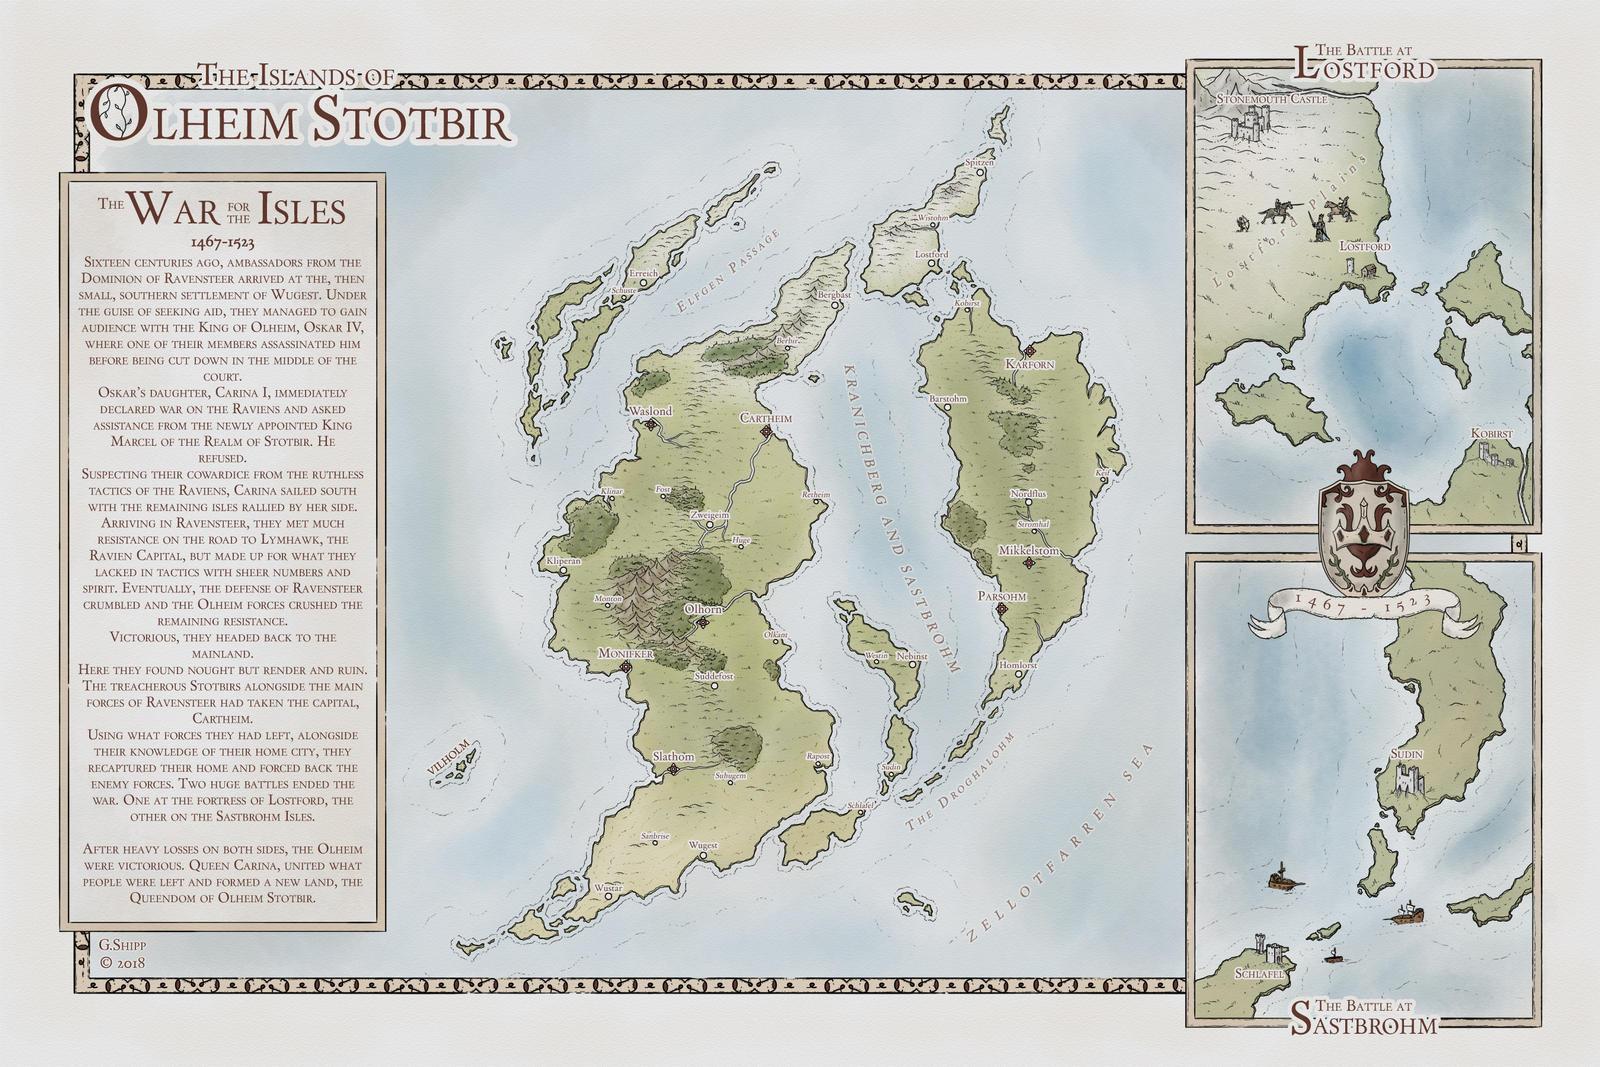 The War of Olheim Stotbir